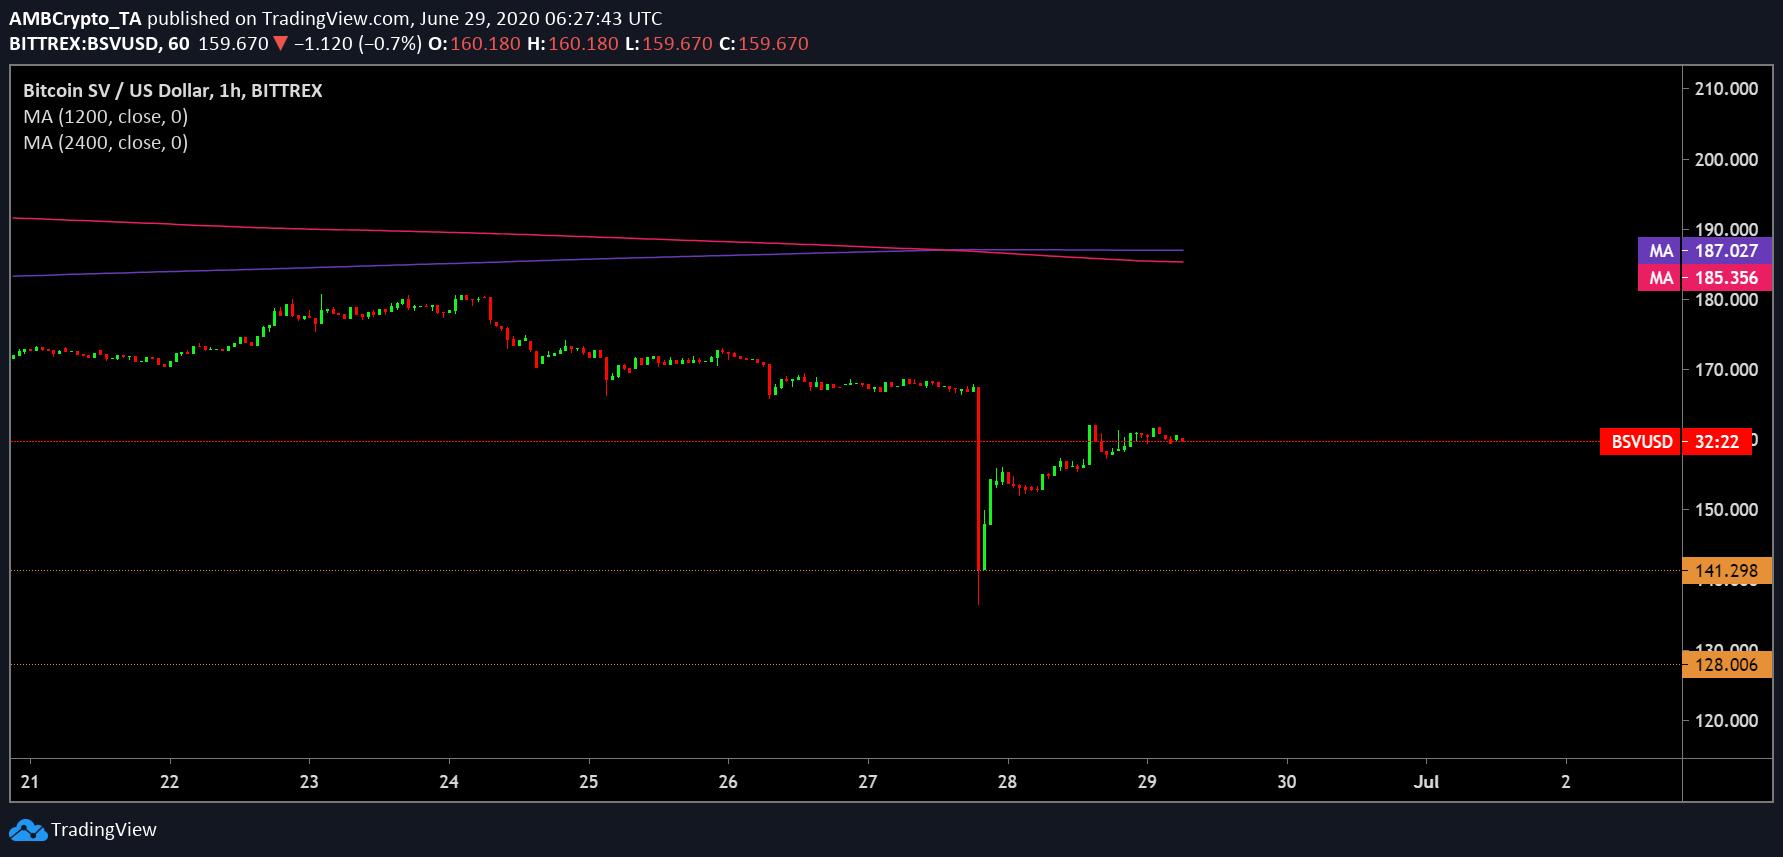 Bitcoin SV short-term price analysis: 29 June